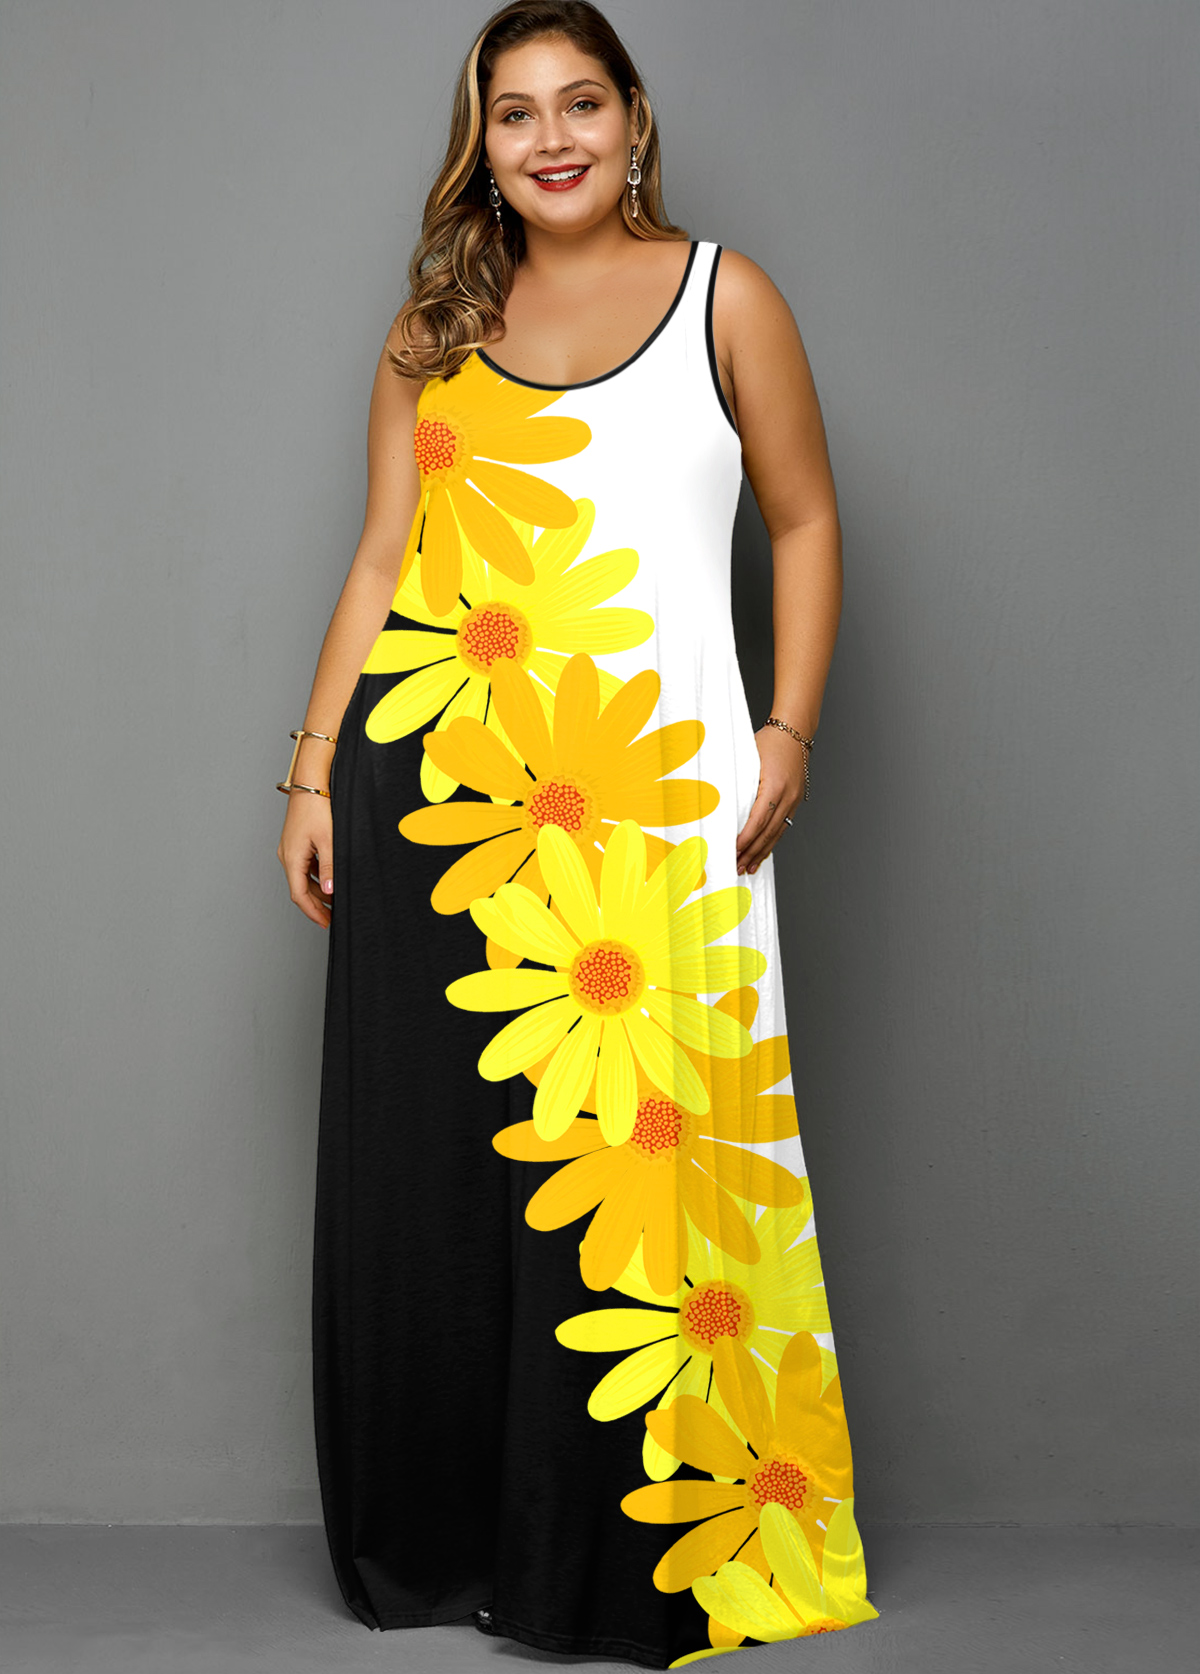 ROTITA Plus Size Spaghetti Strap Daisy Print Pocket Dress